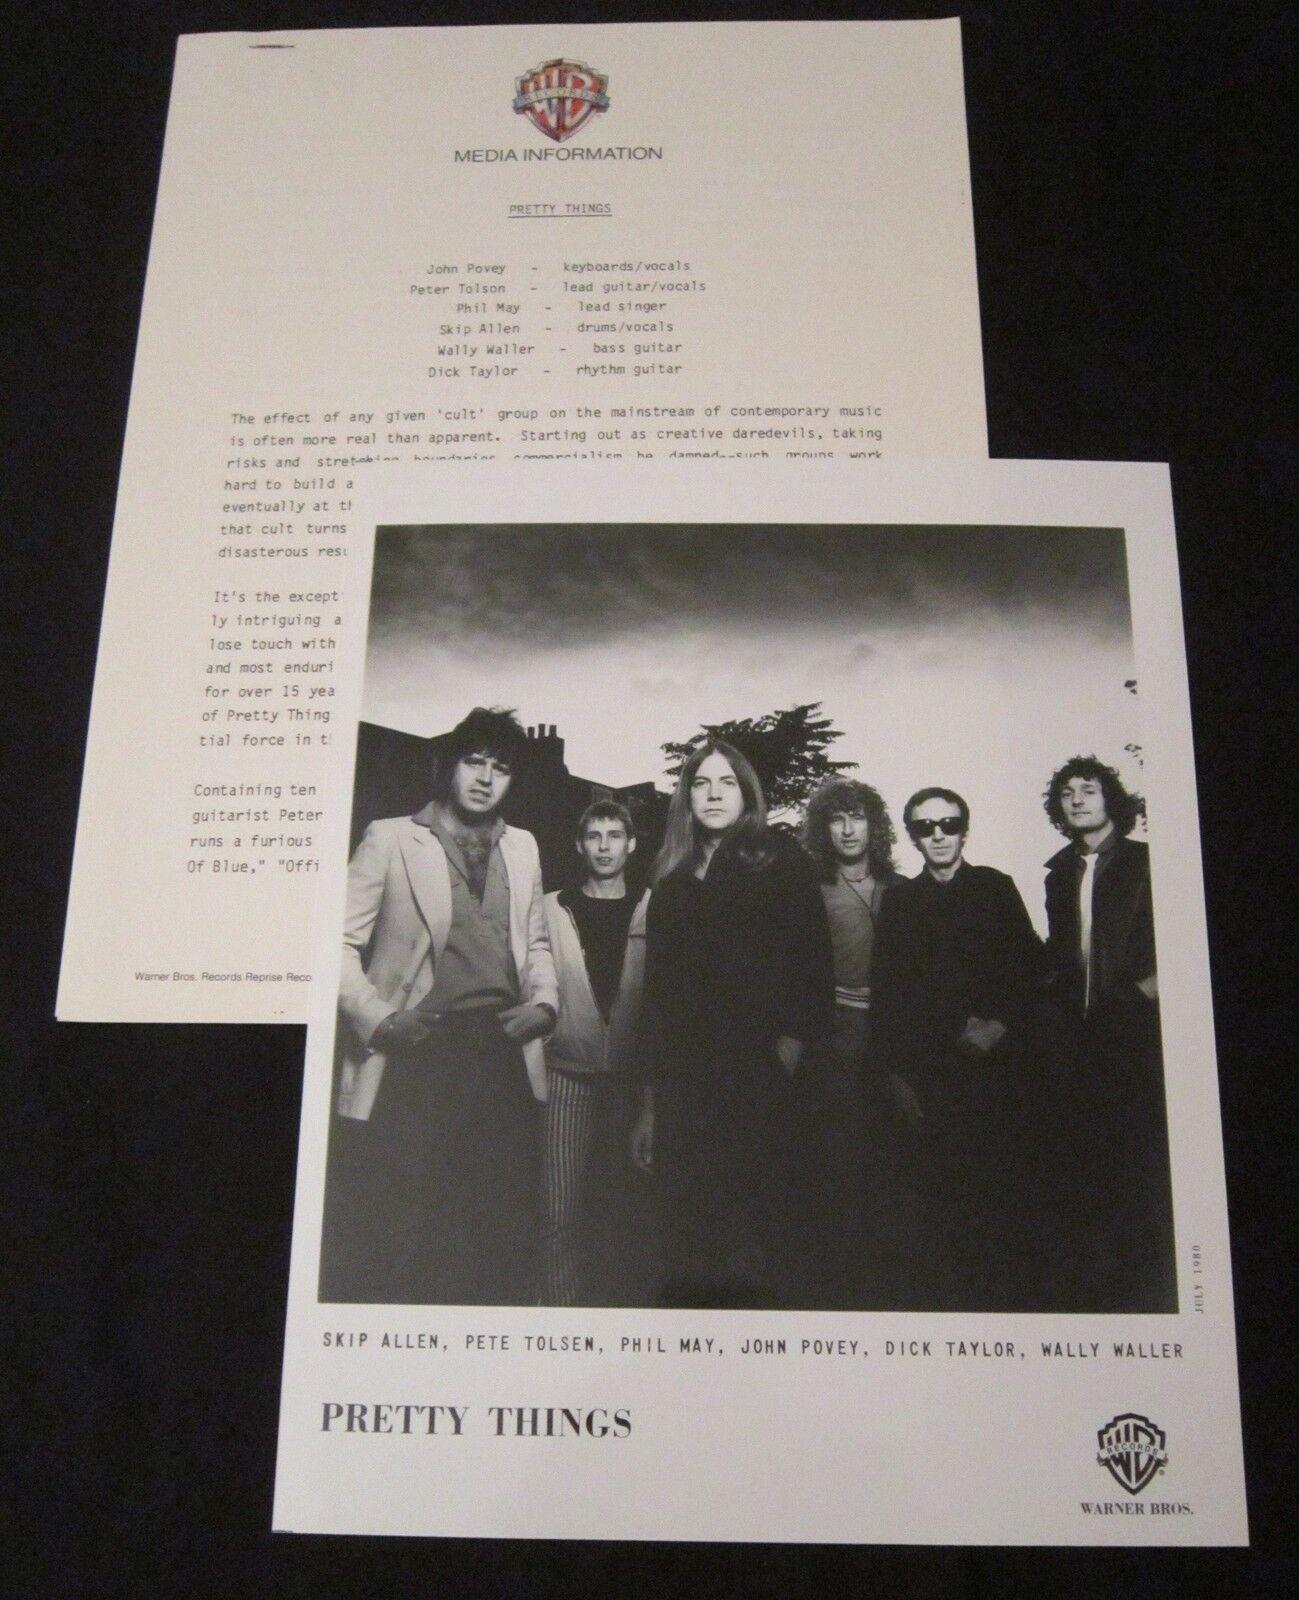 The pretty things 'cross talk' 1980 press kit--photo